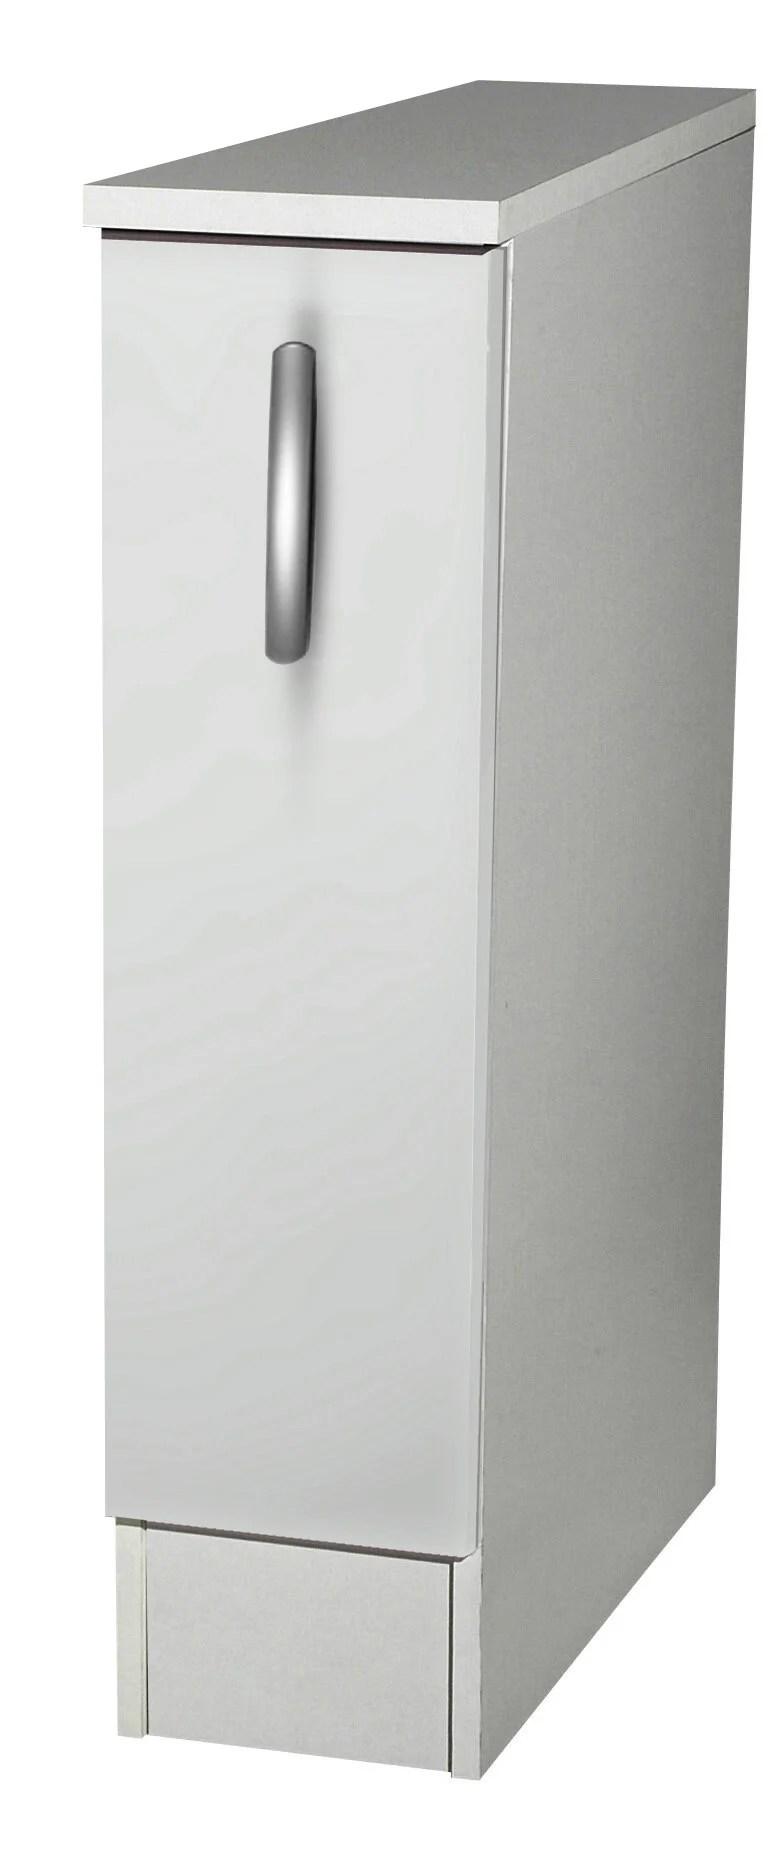 Meuble De Cuisine Bas 1 Porte Blanc H86x L15x P60cm Leroy Merlin